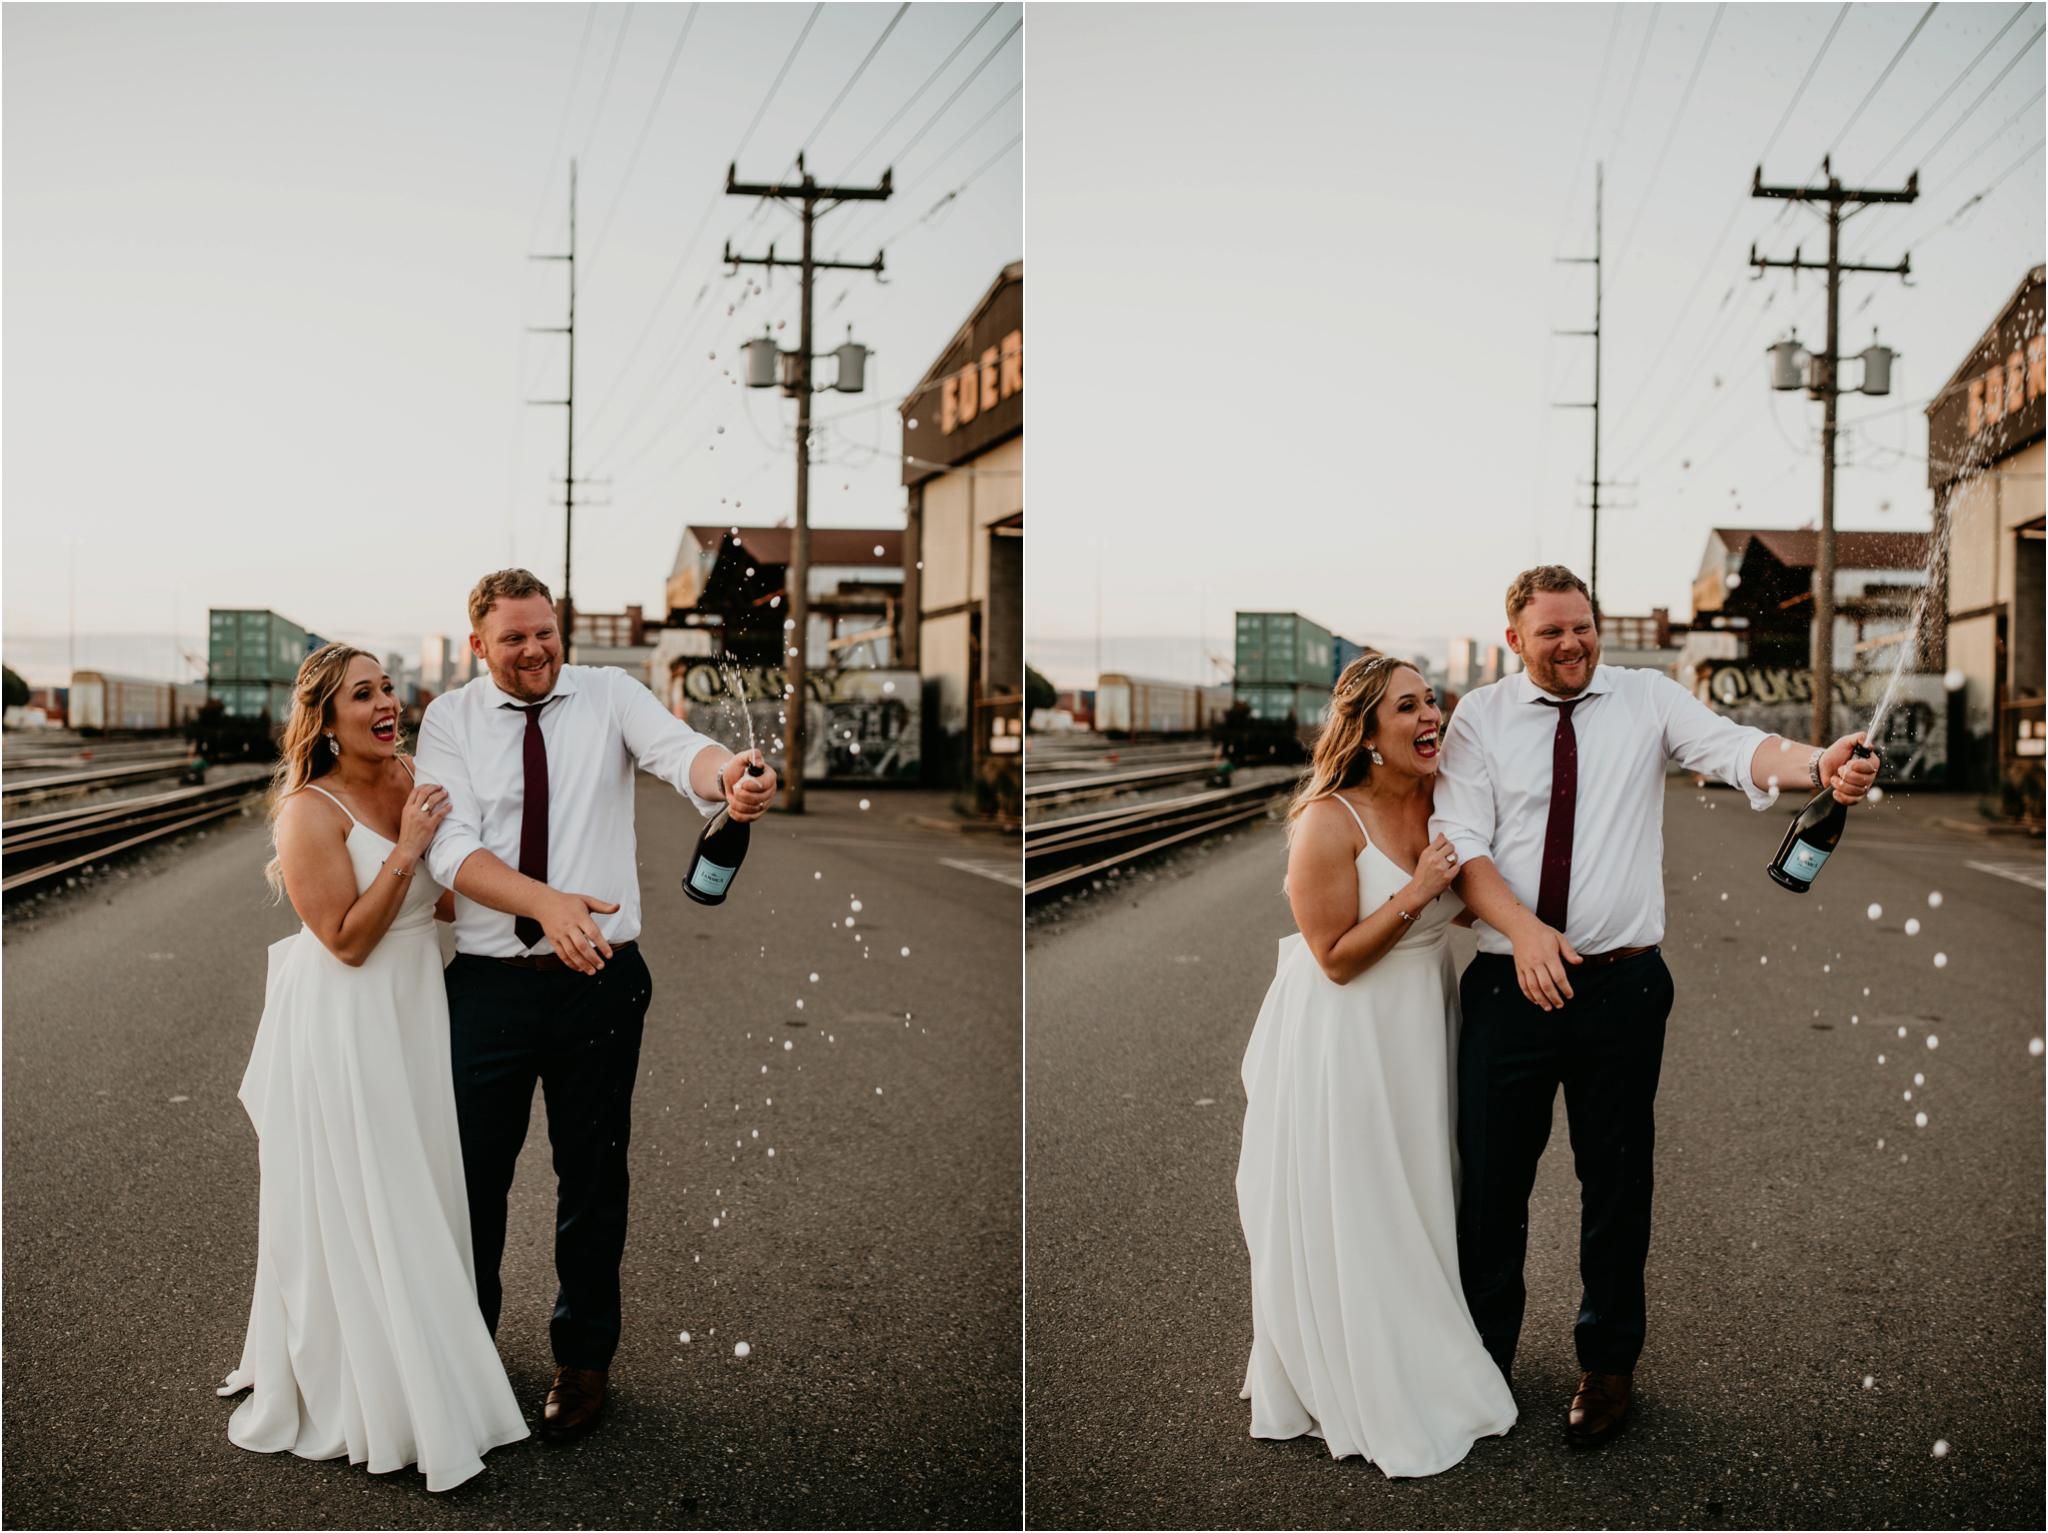 laura-and-matt-metropolist-urban-seattle-wedding-photographer-158.jpg